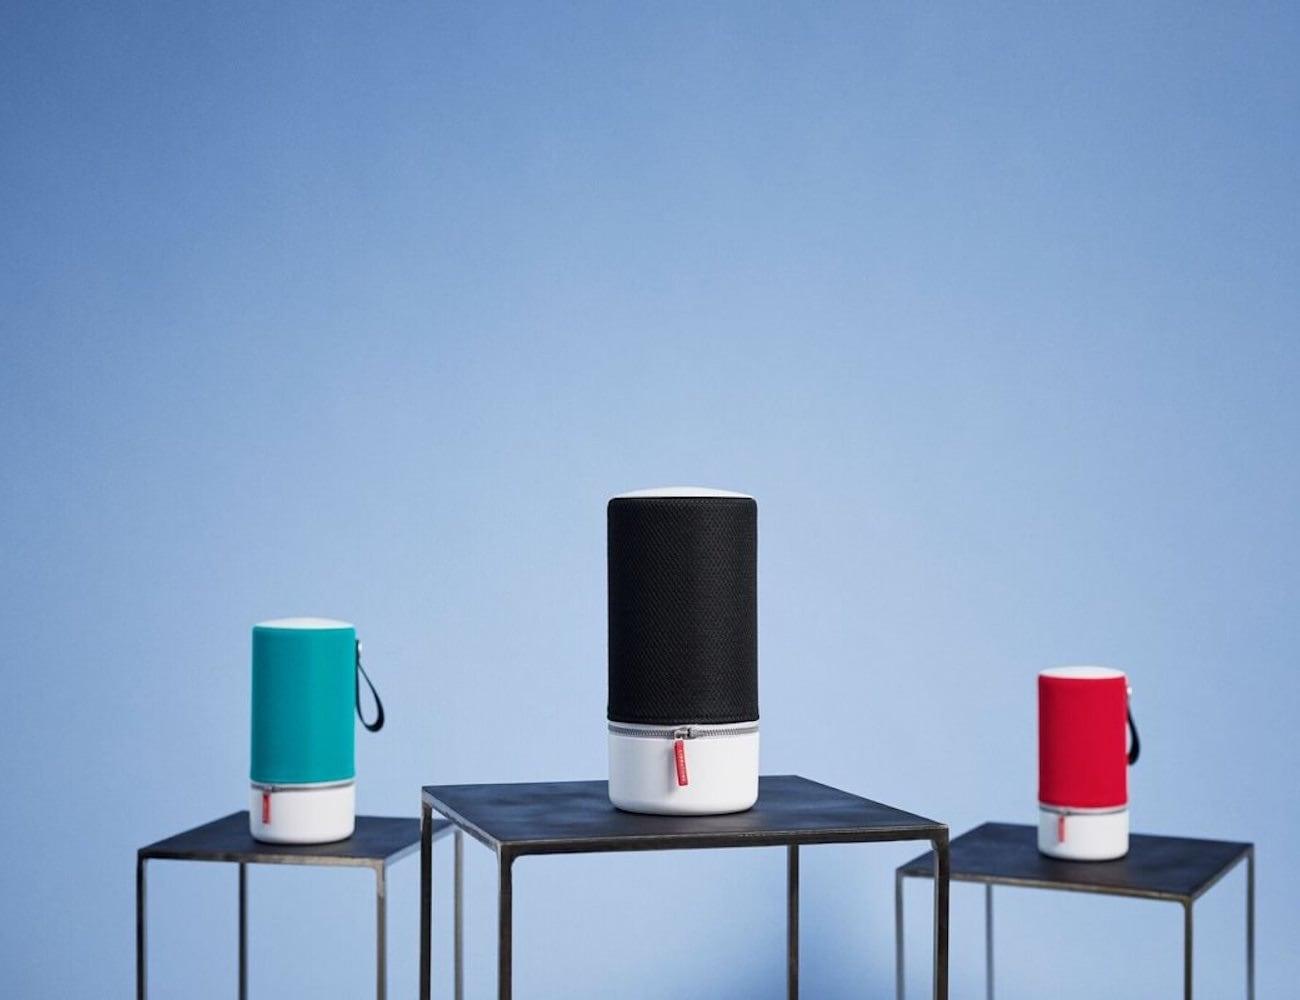 Libratone Zipp 2 Smart Portable Alexa Speakers